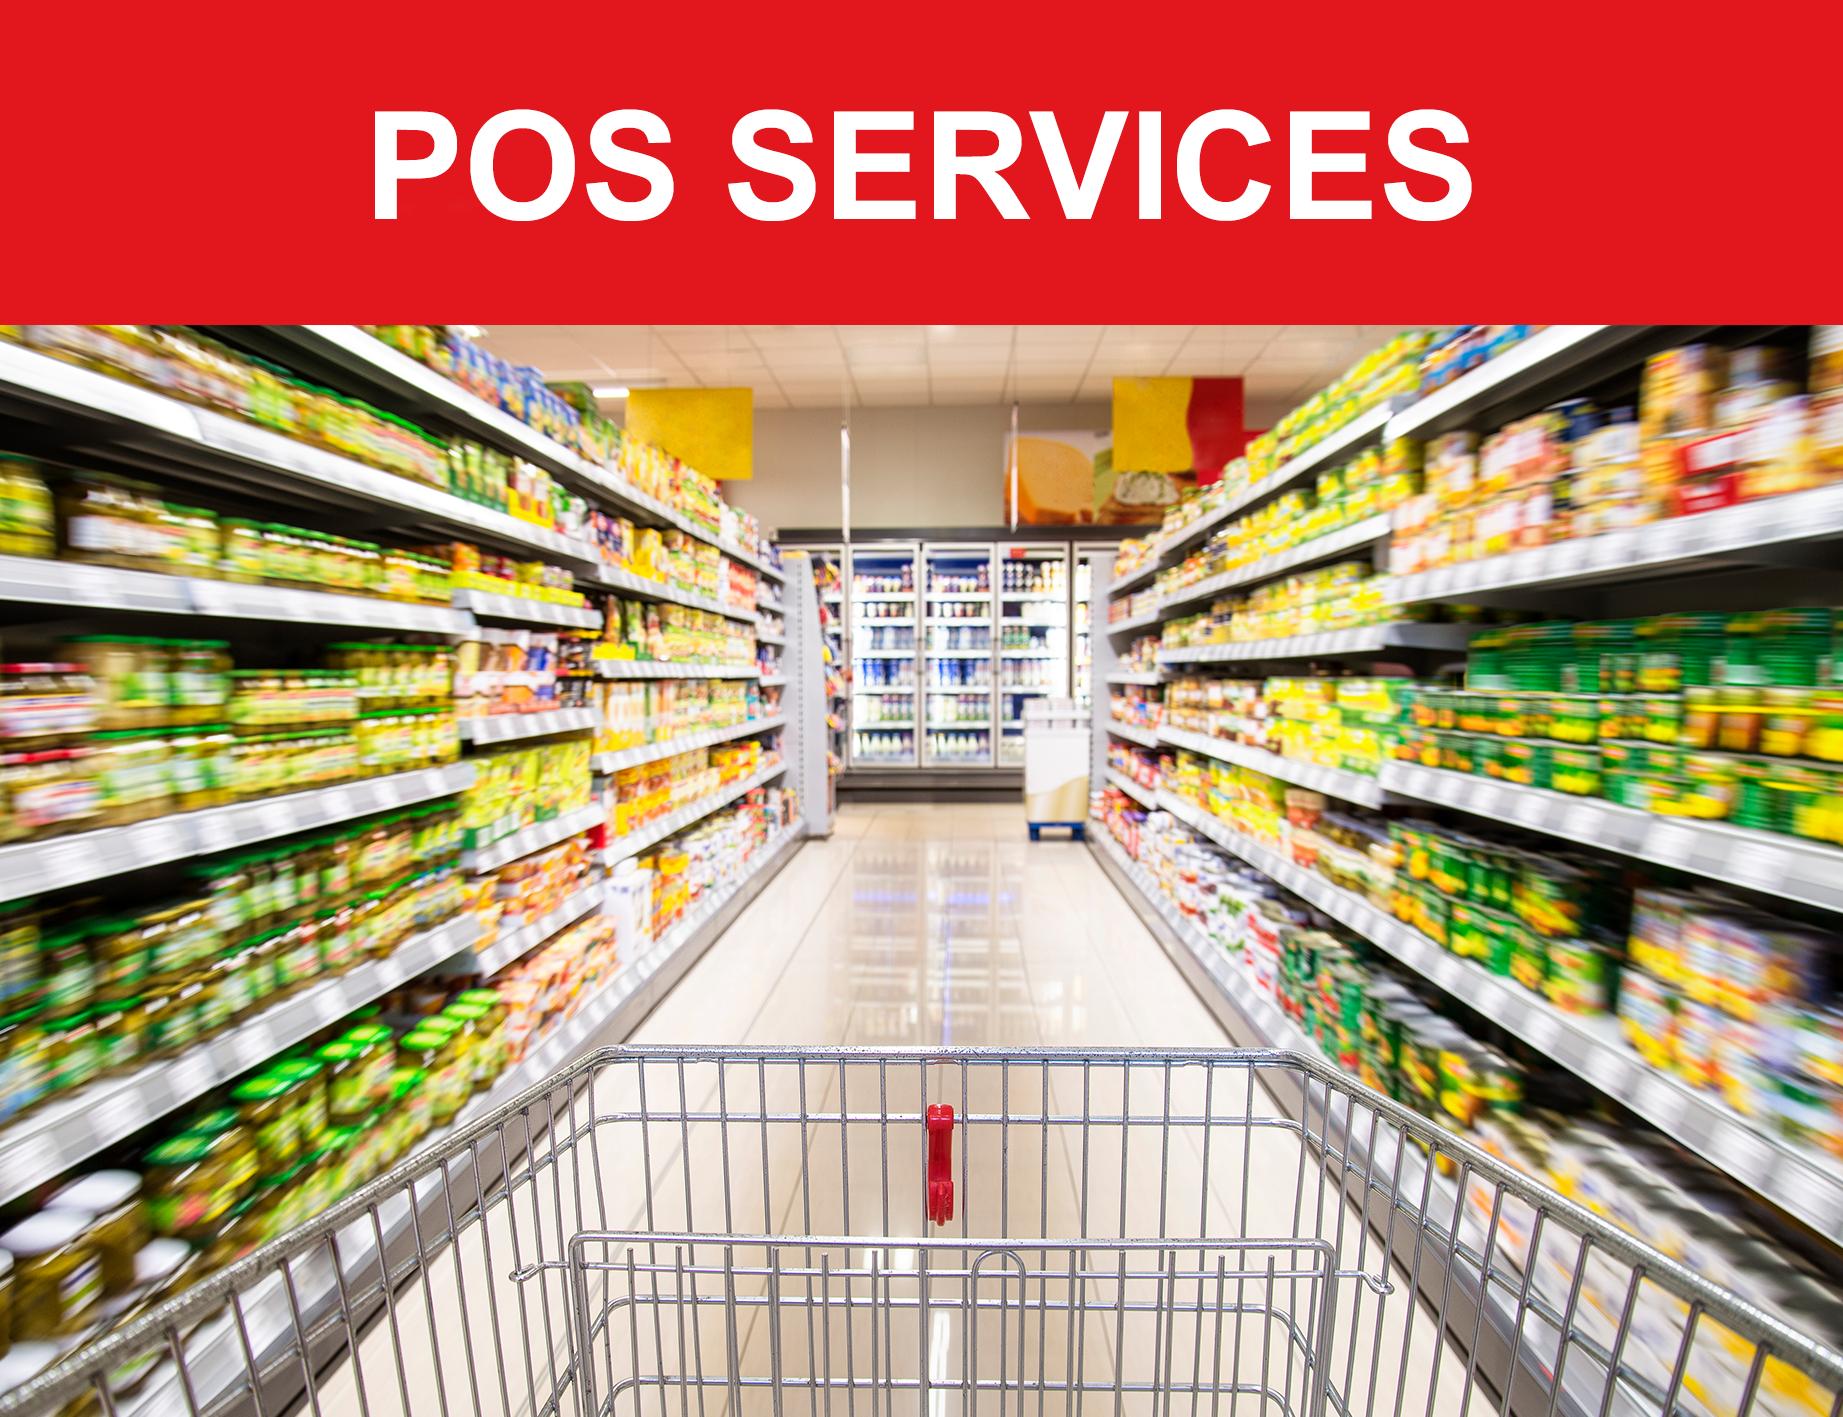 POS Services